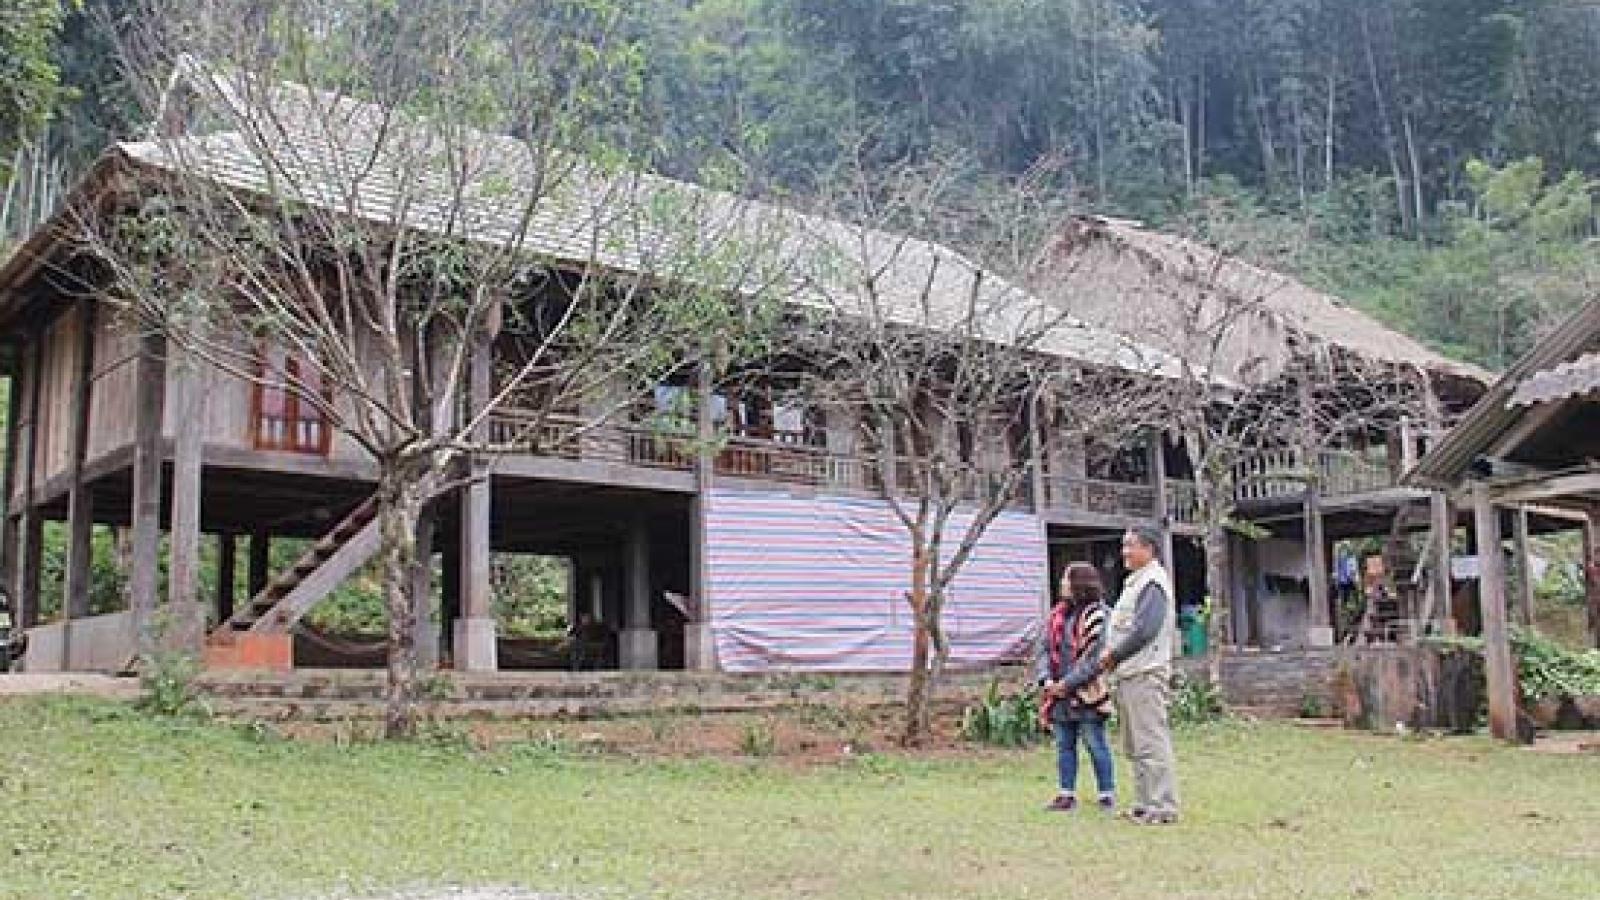 Homestay service makes Moc Chau more appealing